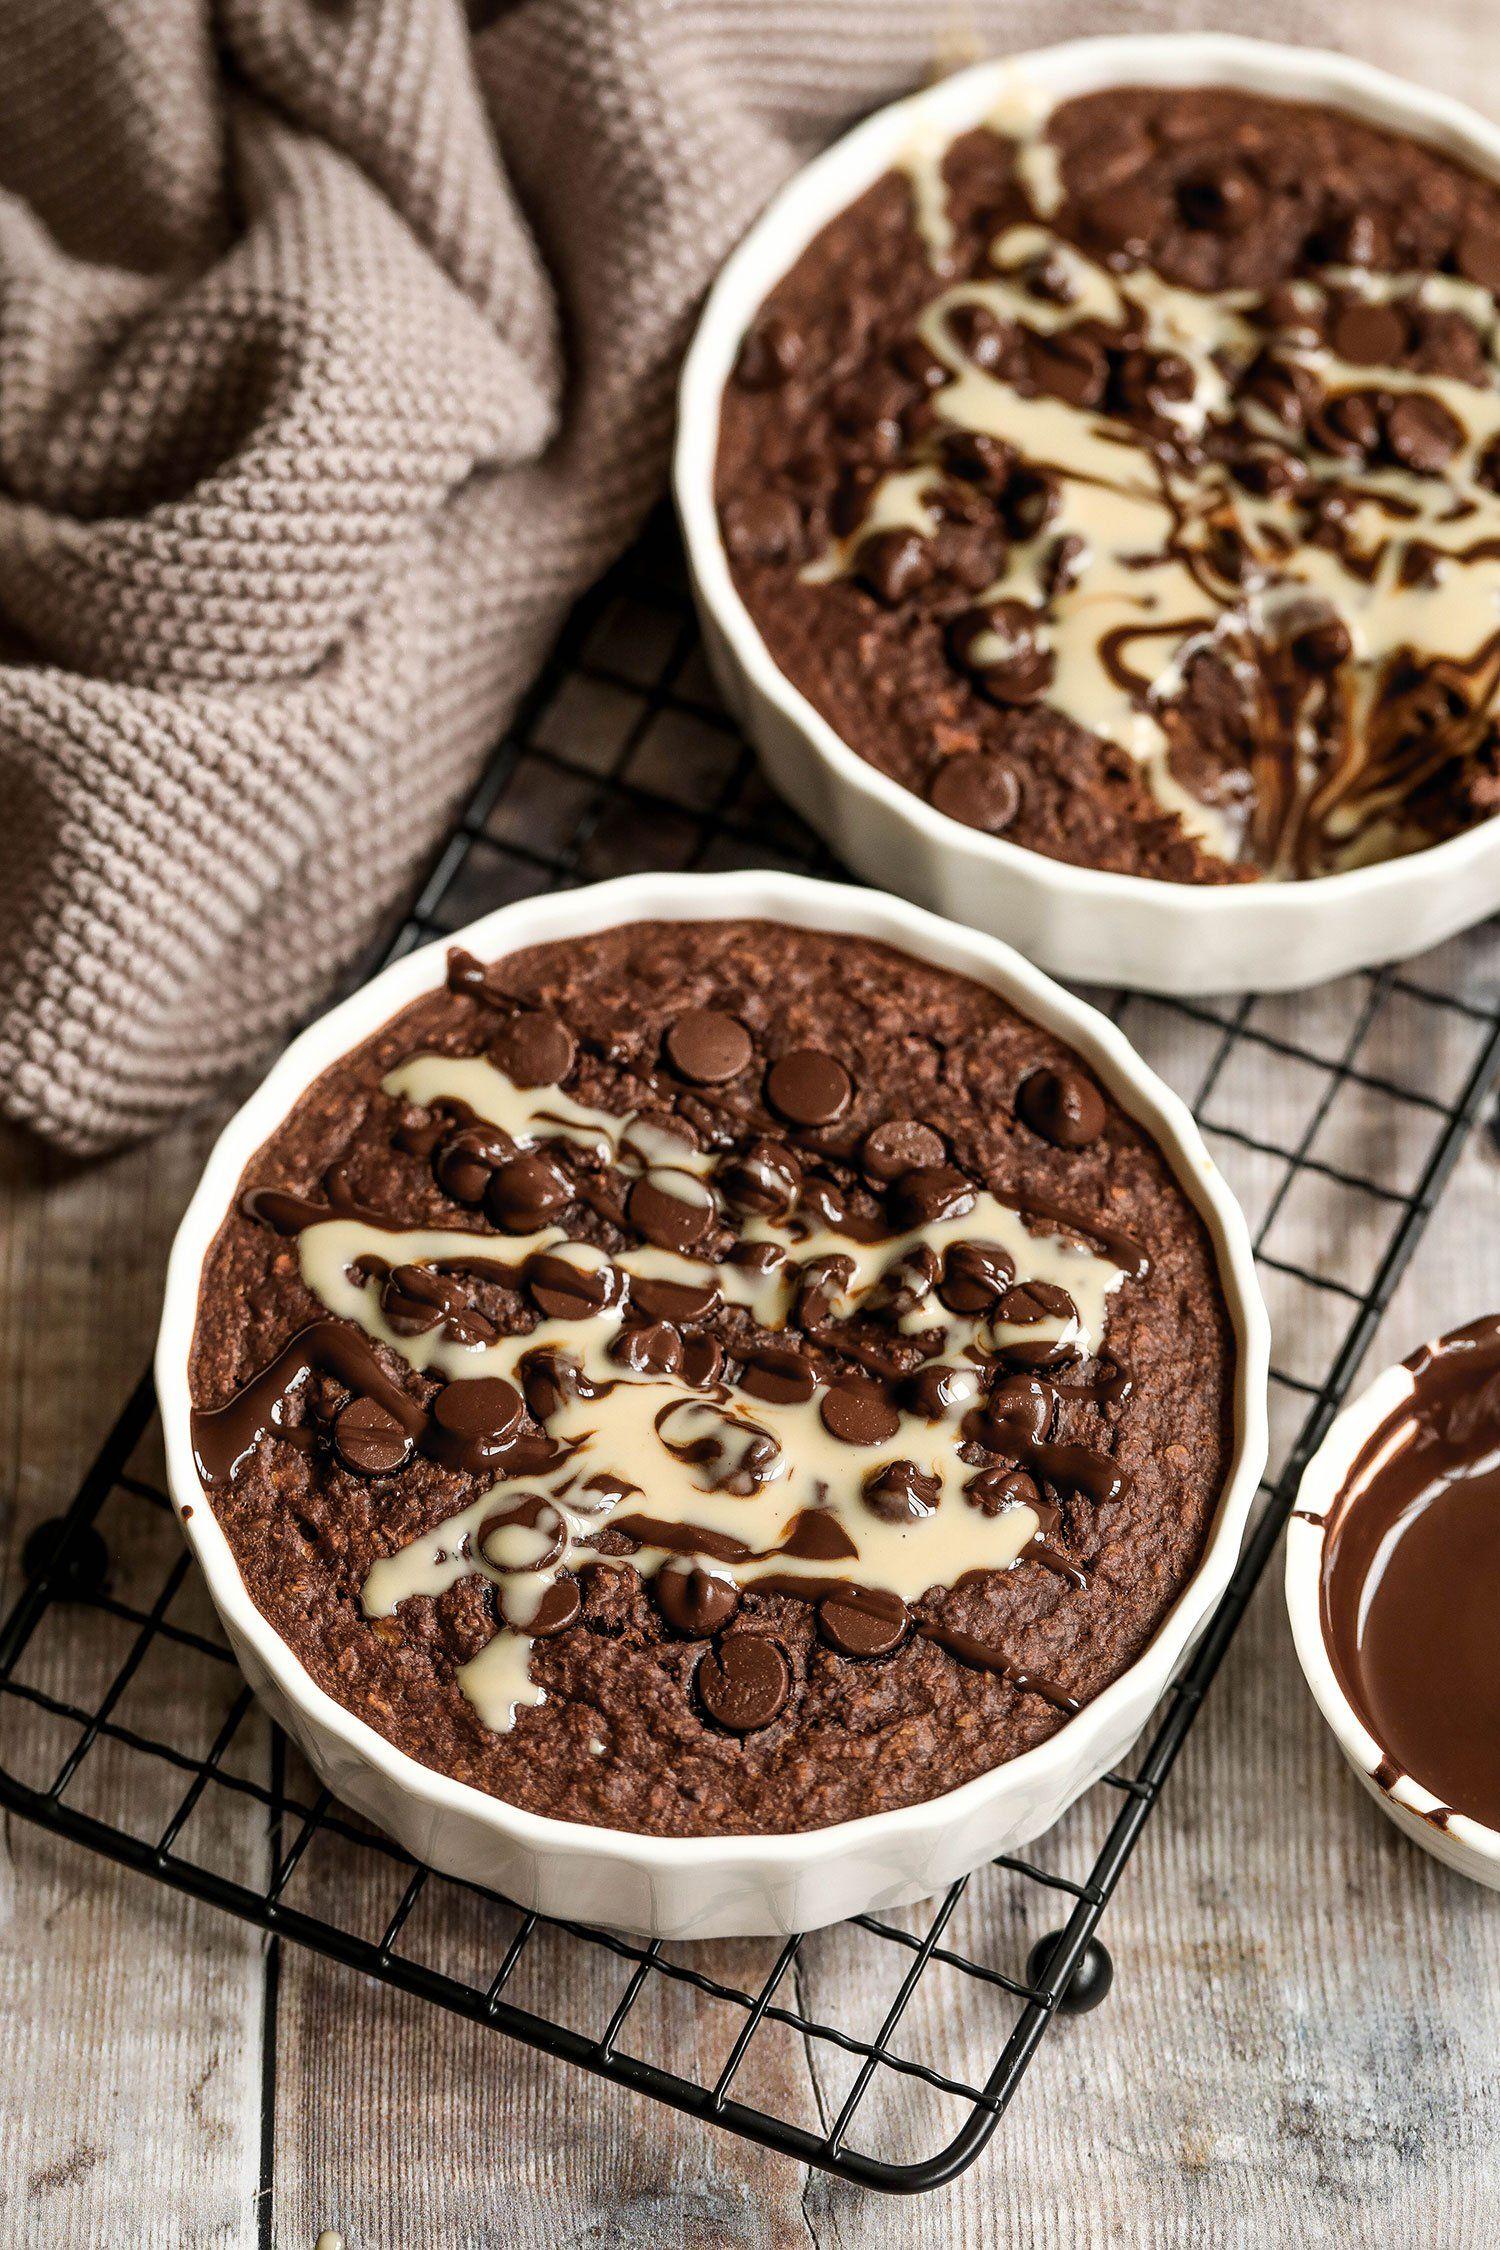 Vegan Gluten Free Baked Chocolate Oats Uk Health Blog Nadia S Healthy Kitchen Dessert For Dinner Chocolate Oats Basic Butter Cookies Recipe